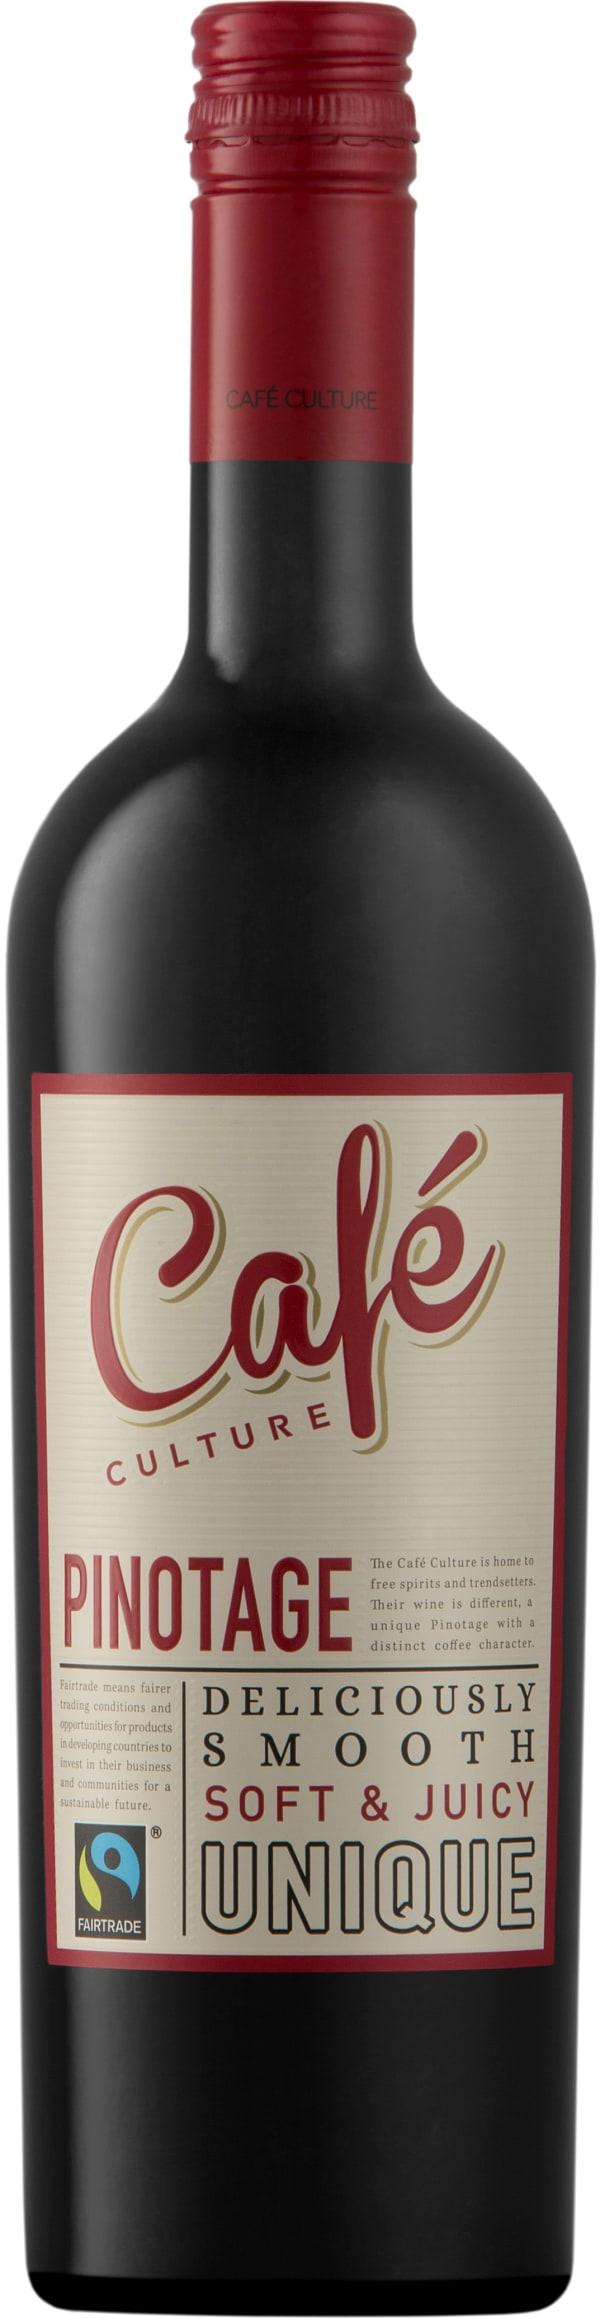 Café Culture Pinotage 2016